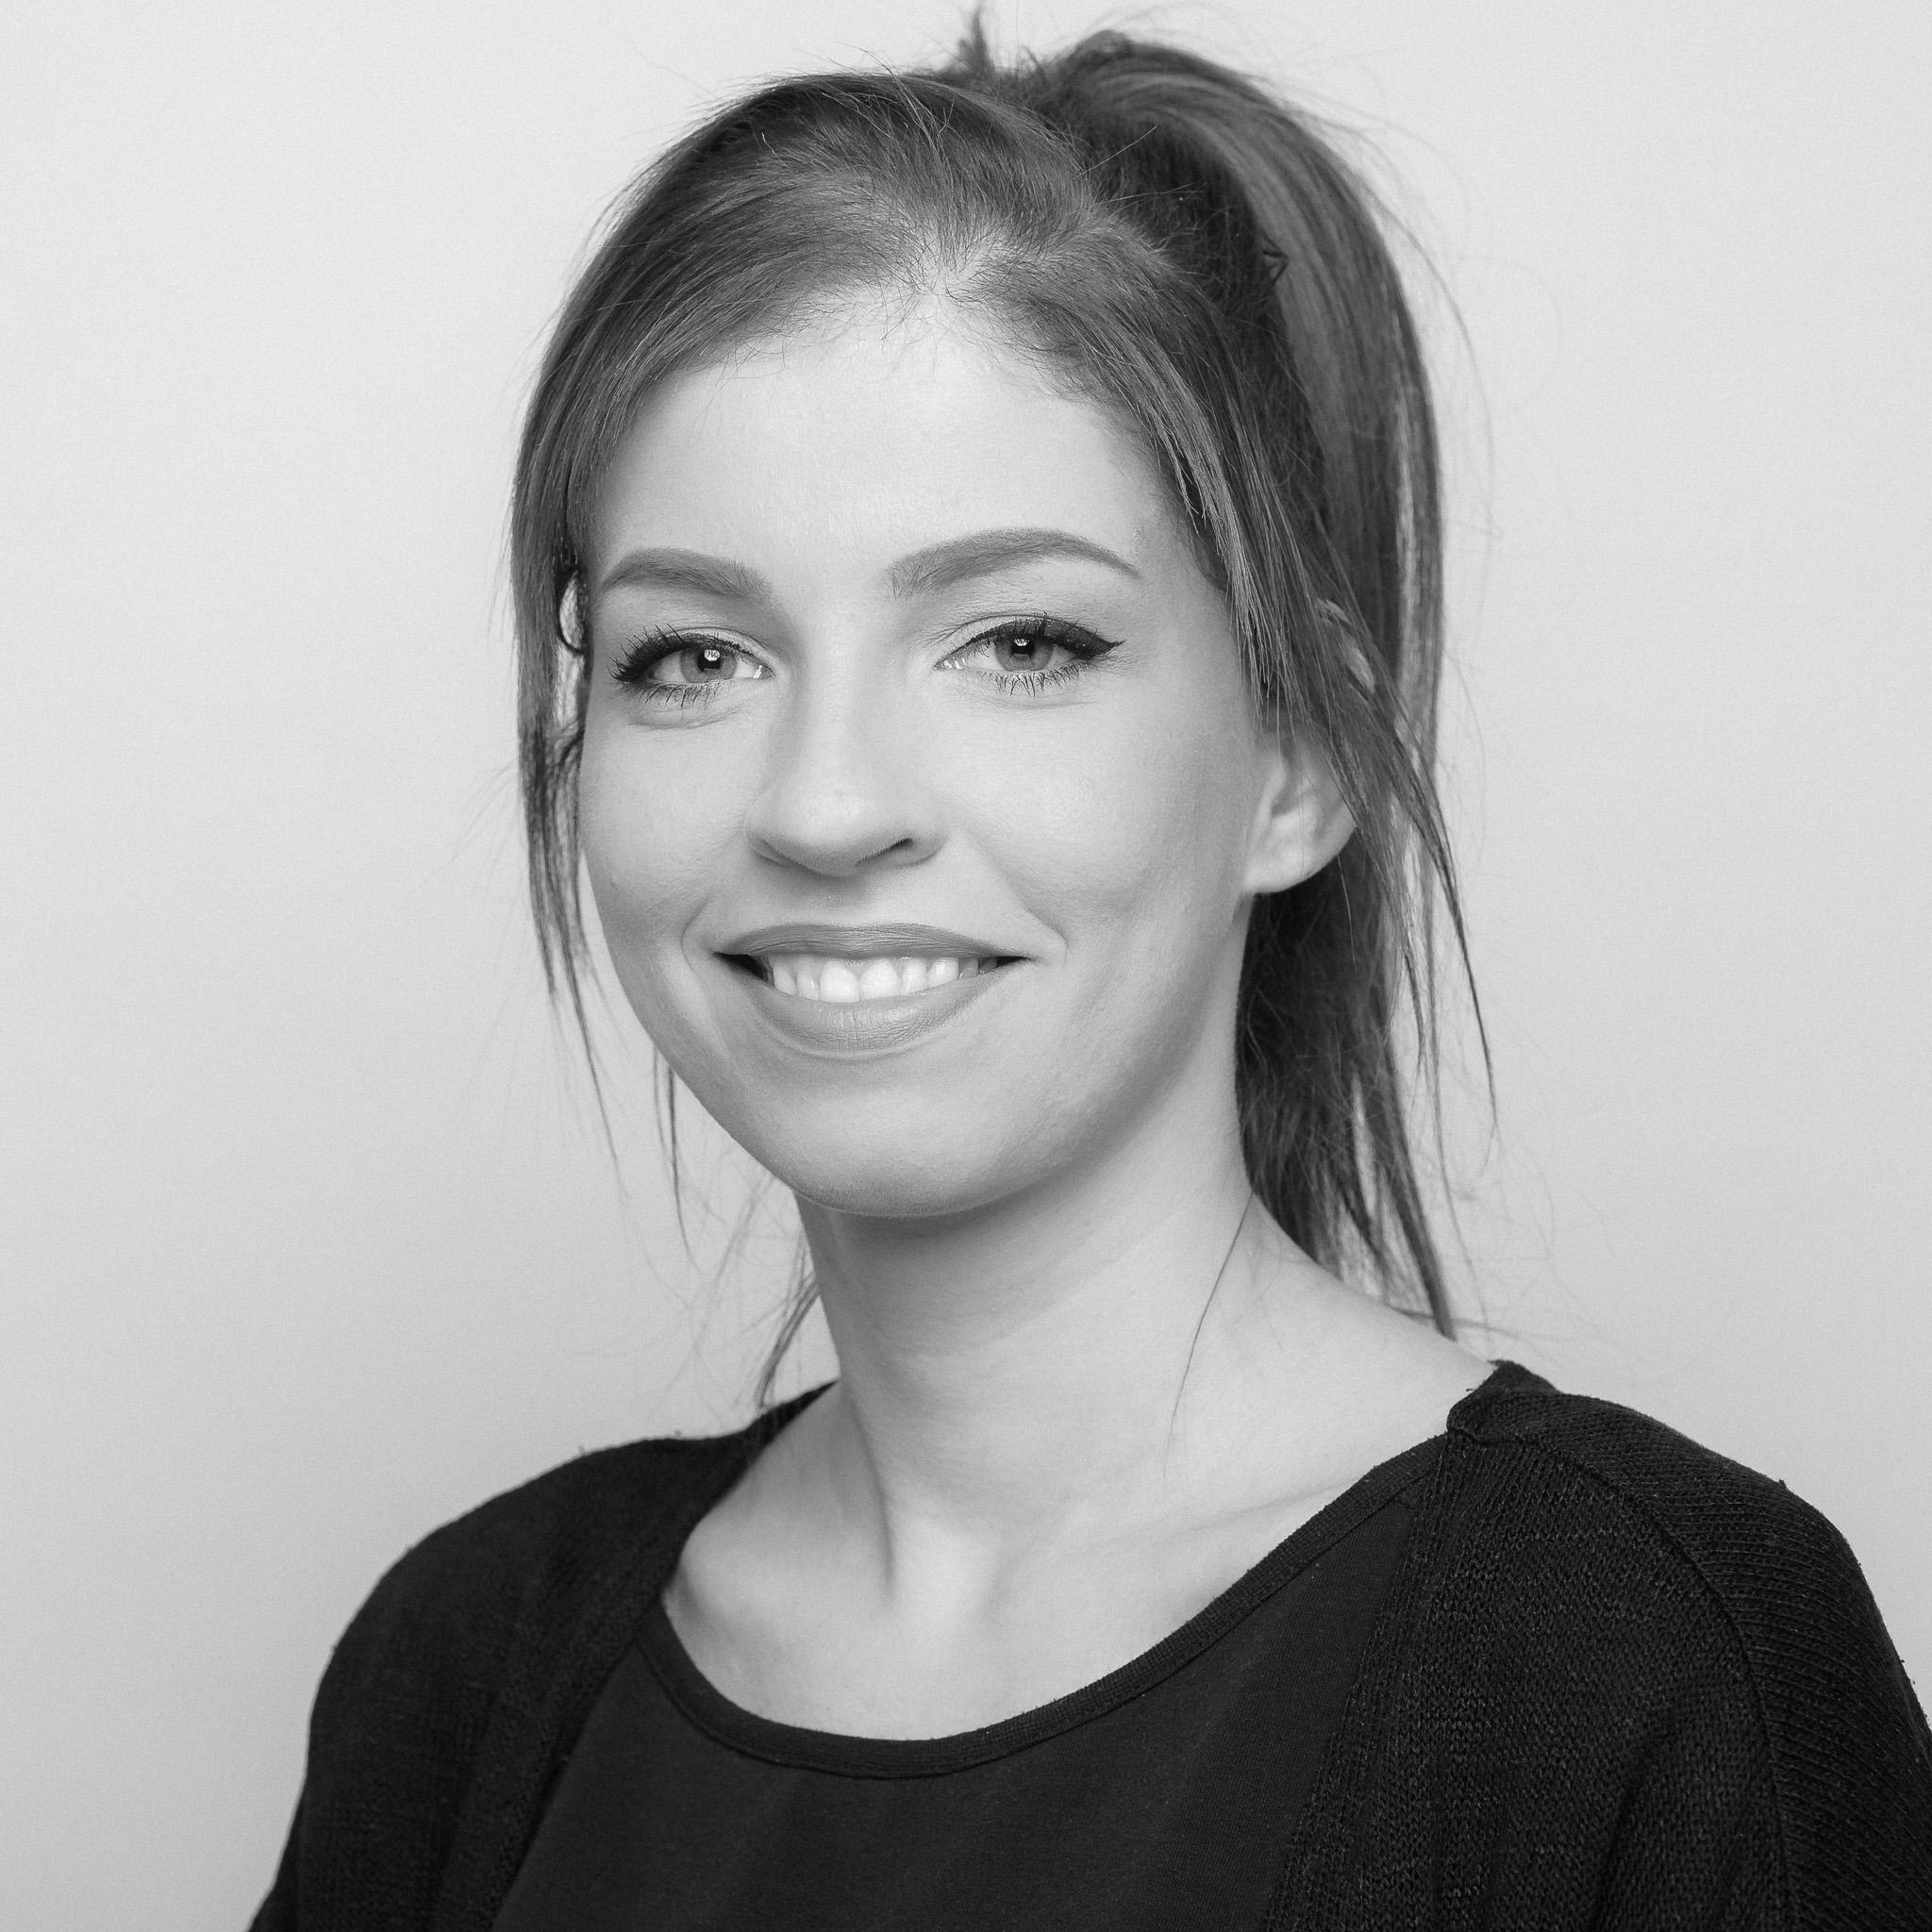 Janine Löper